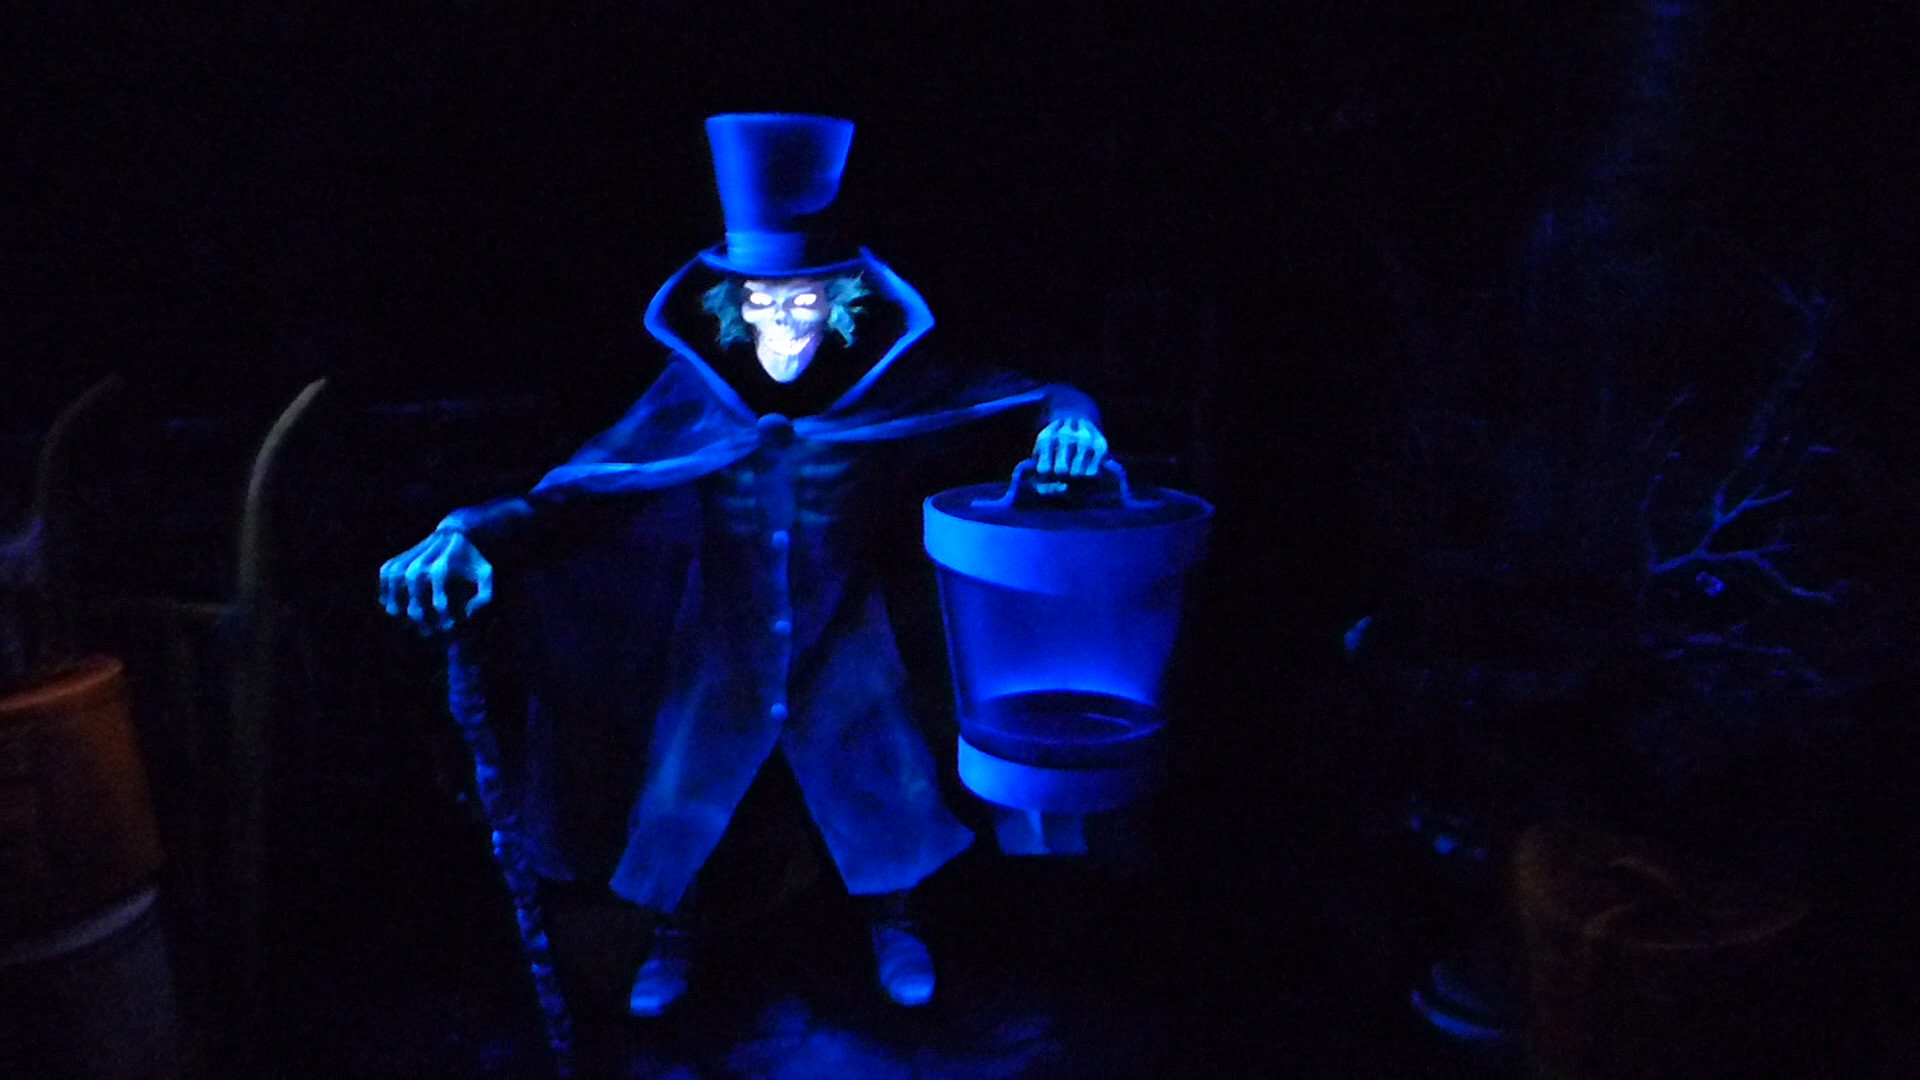 Disney Haunted Mansion Wallpaper 52 Images